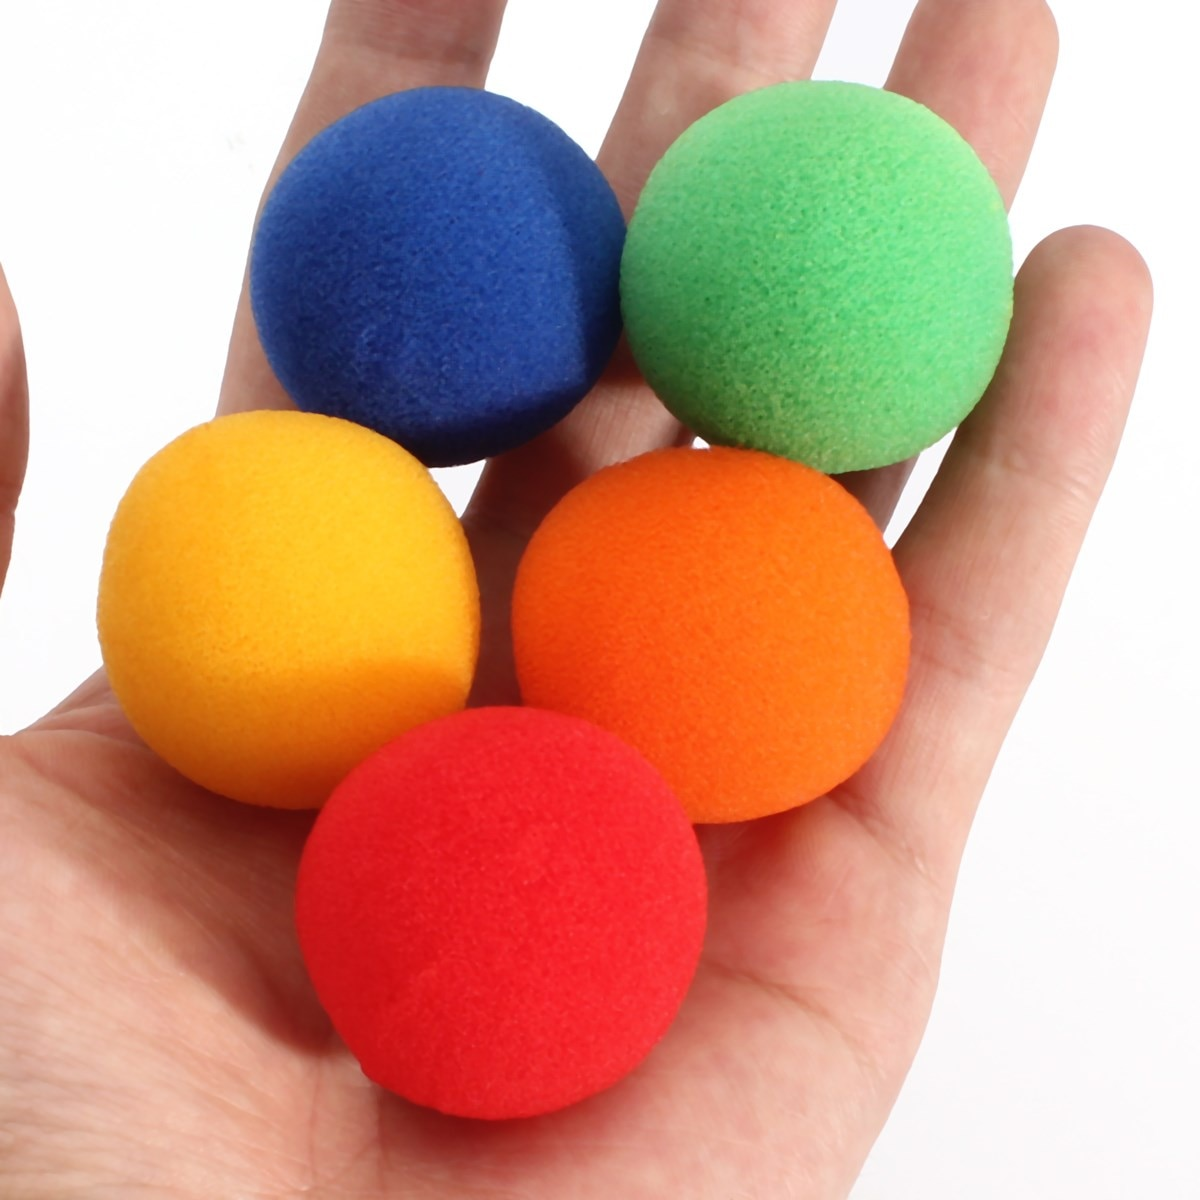 5 unids/set Close Up magia callejera clásica comedia truco bolas de esponja suave 3,5 cm tamaño mediano